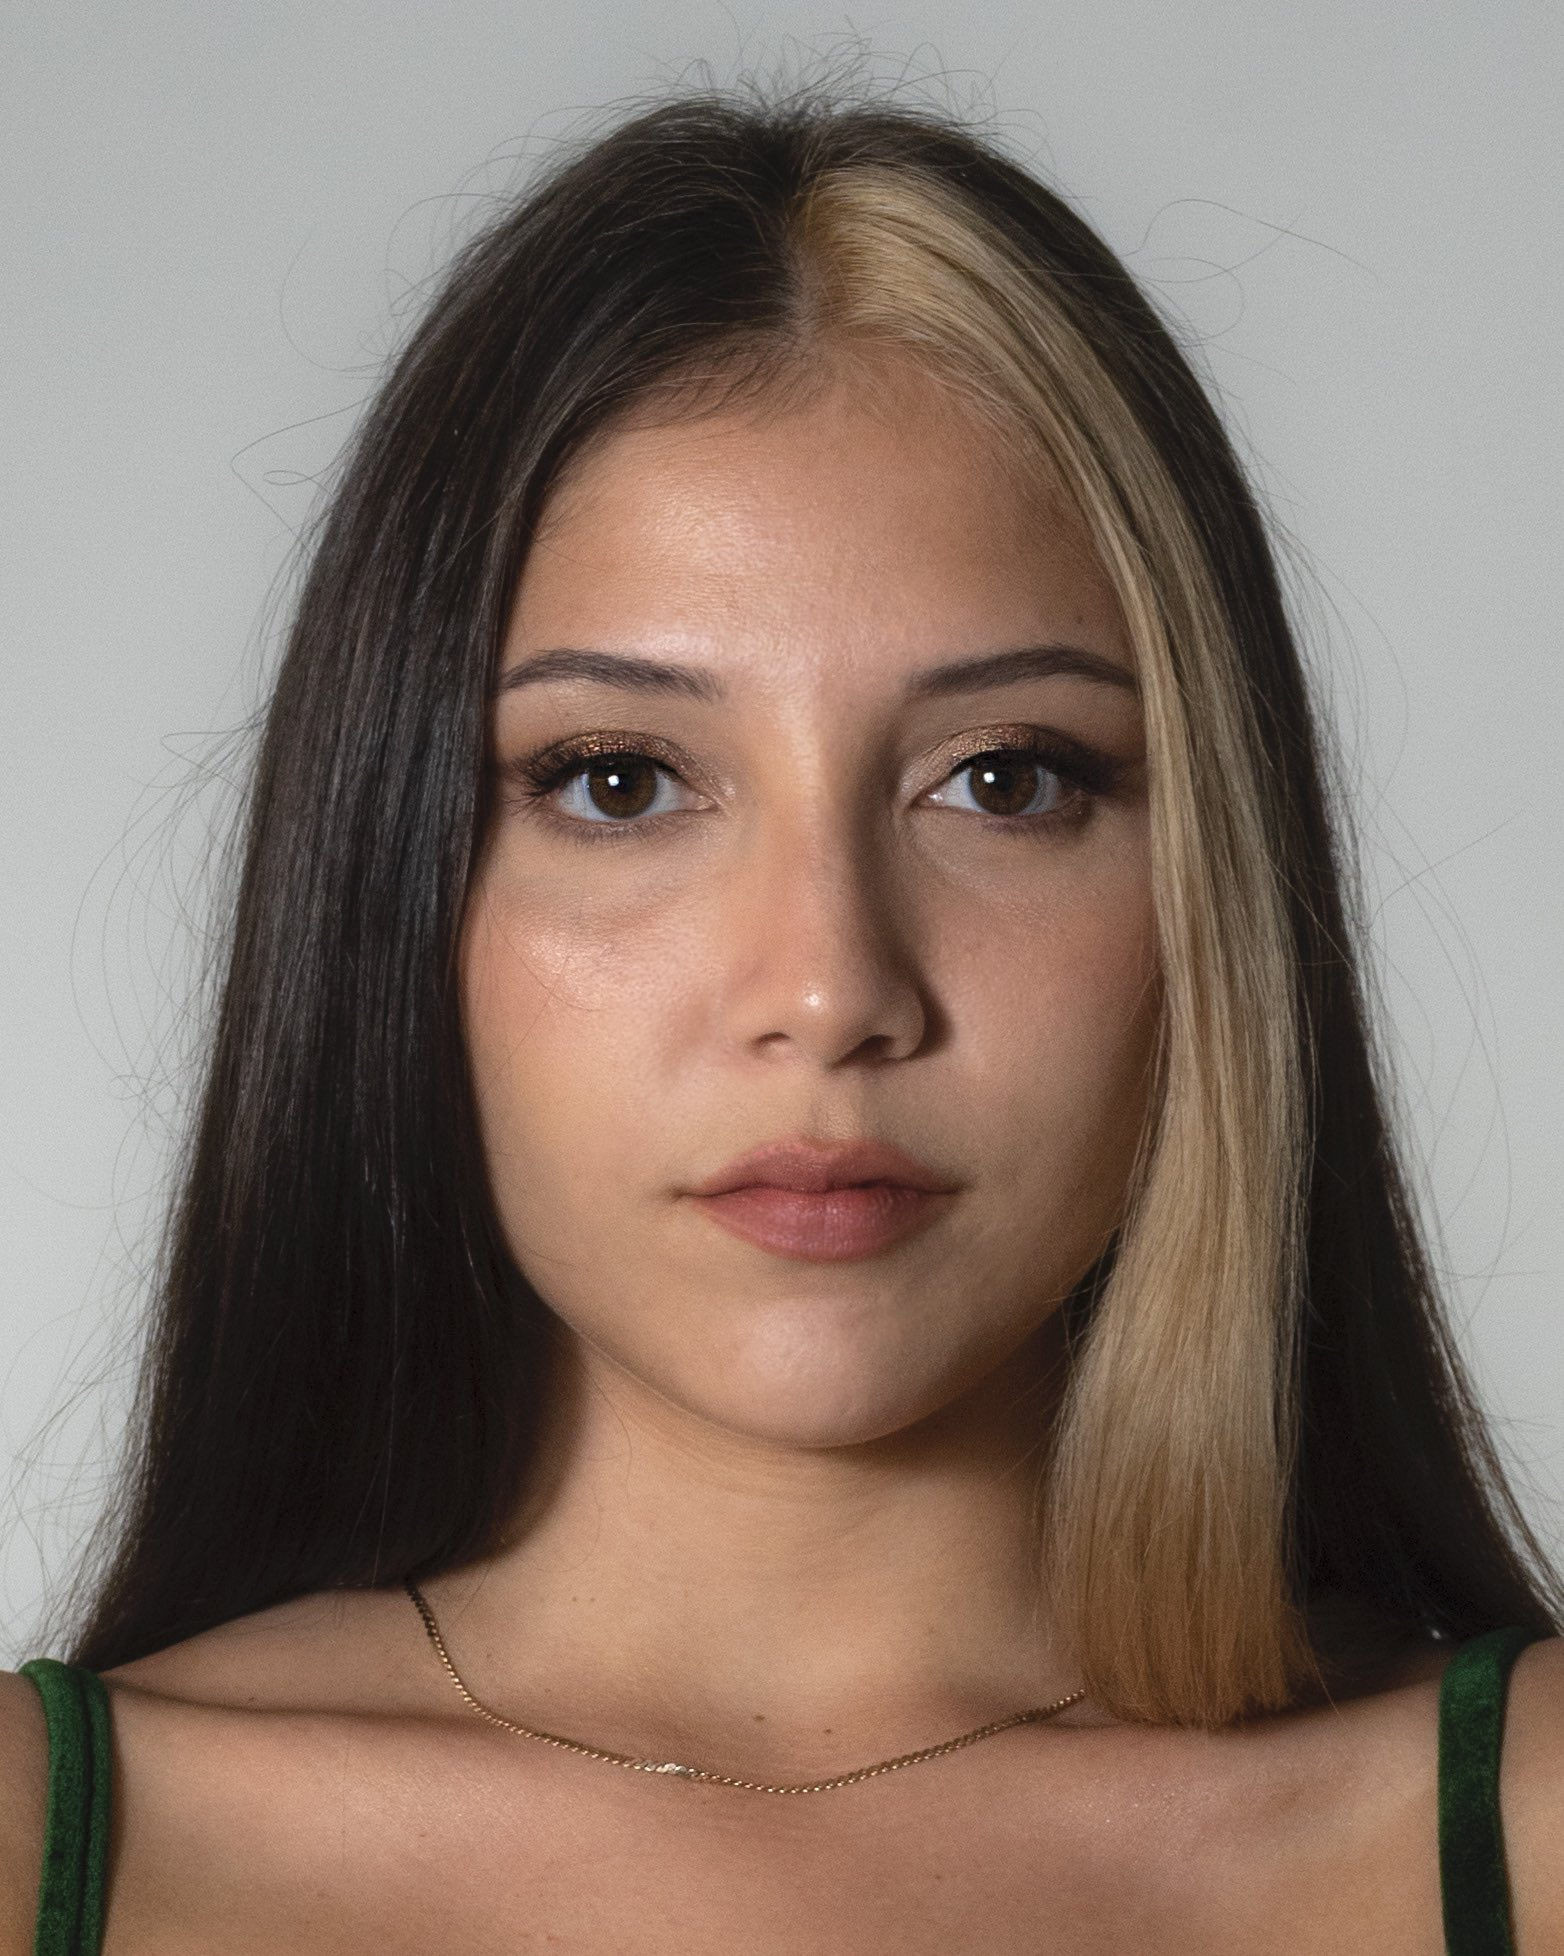 Headshot of Mercedes Ventura, portrait style.